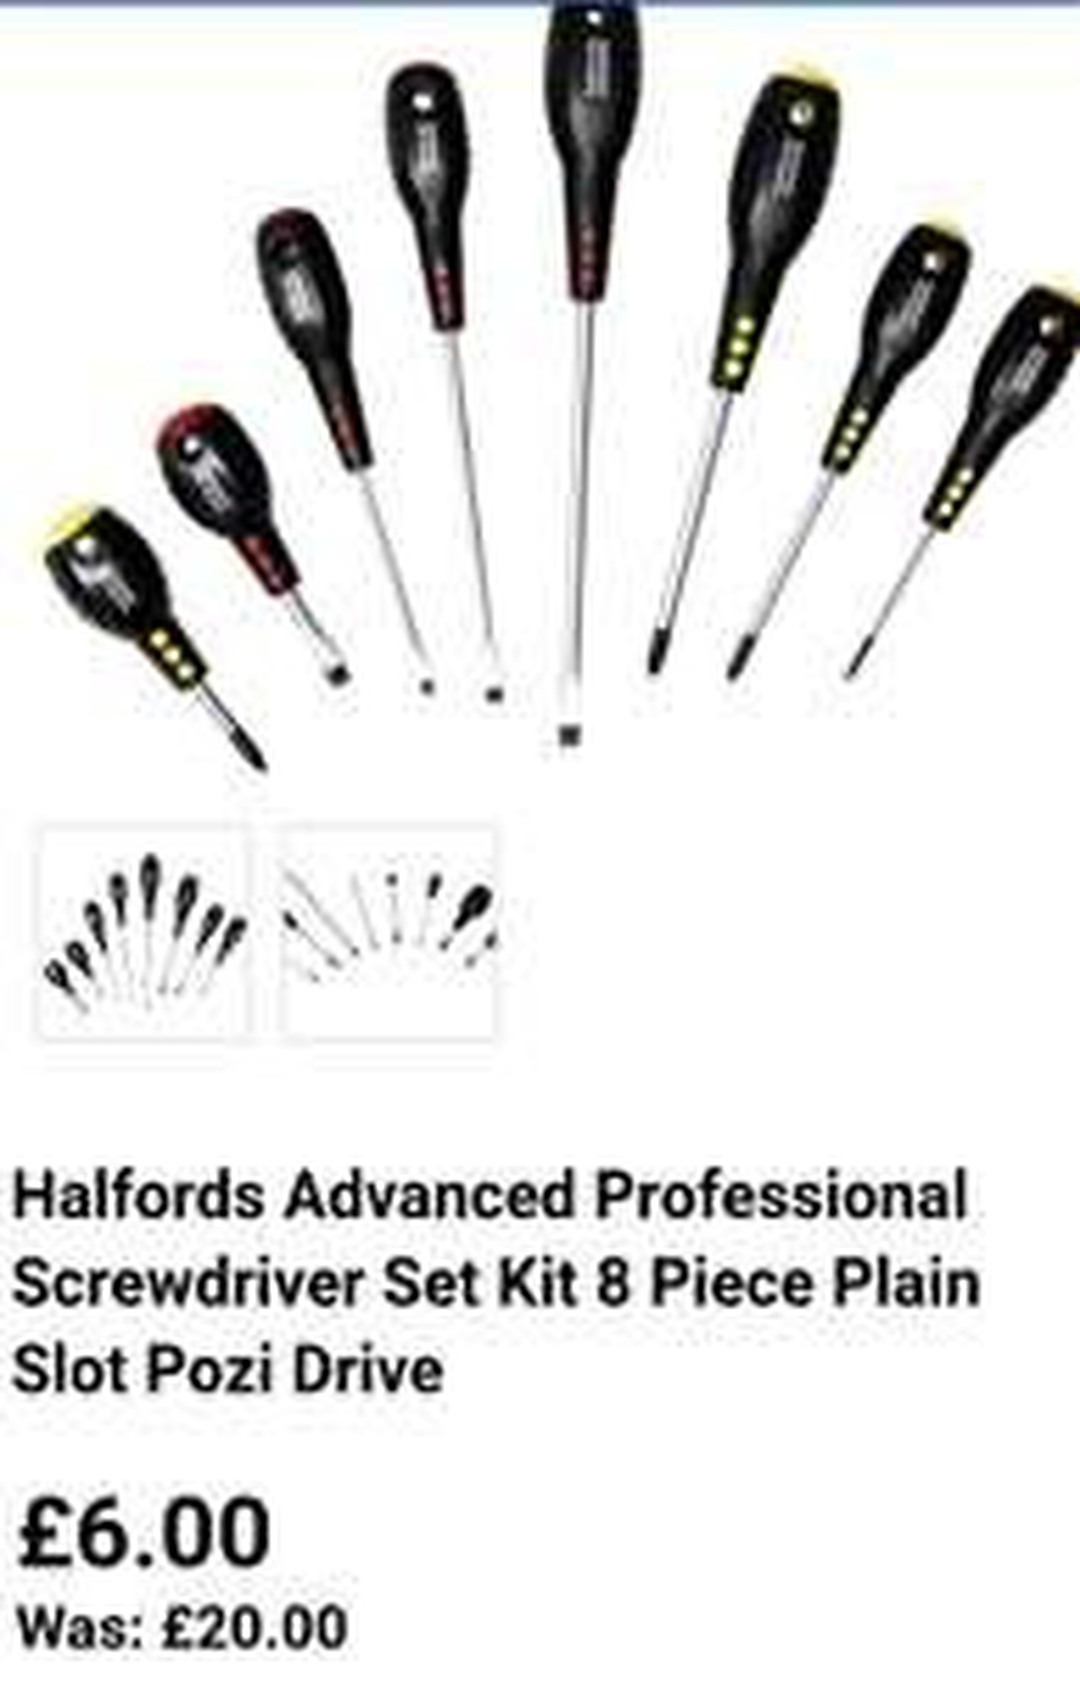 Halfords Advanced Professional Screwdriver Set Kit 8 Pieuce Plain Slot Pozi Drive- £6 C&C or £4.80 C&C with trade card or £9.99 delivered @Halfords eBay